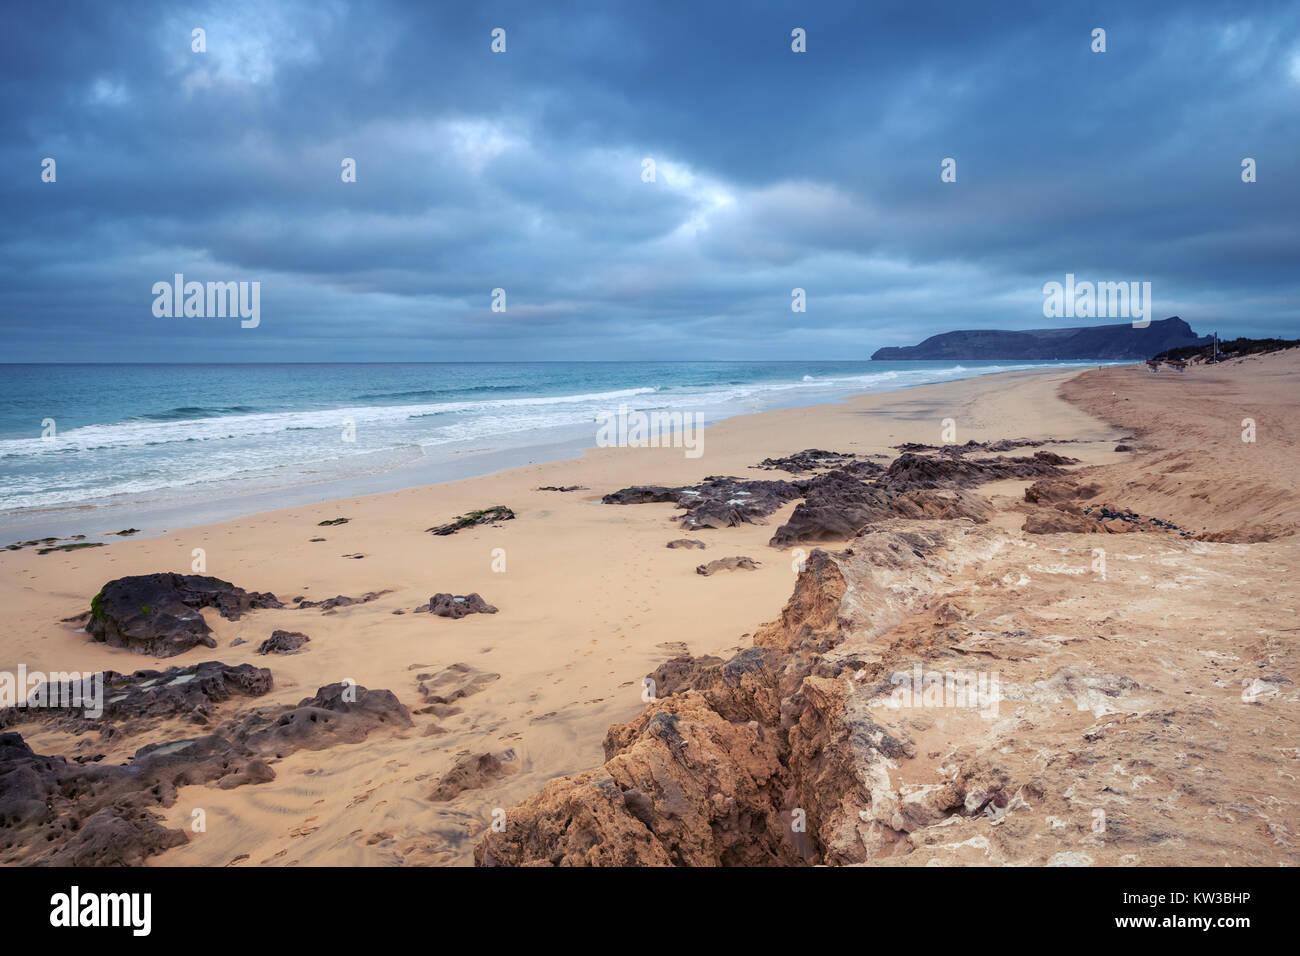 Sandstone rocks on the beach of Porto Santo island in the Madeira archipelago, Portugal - Stock Image